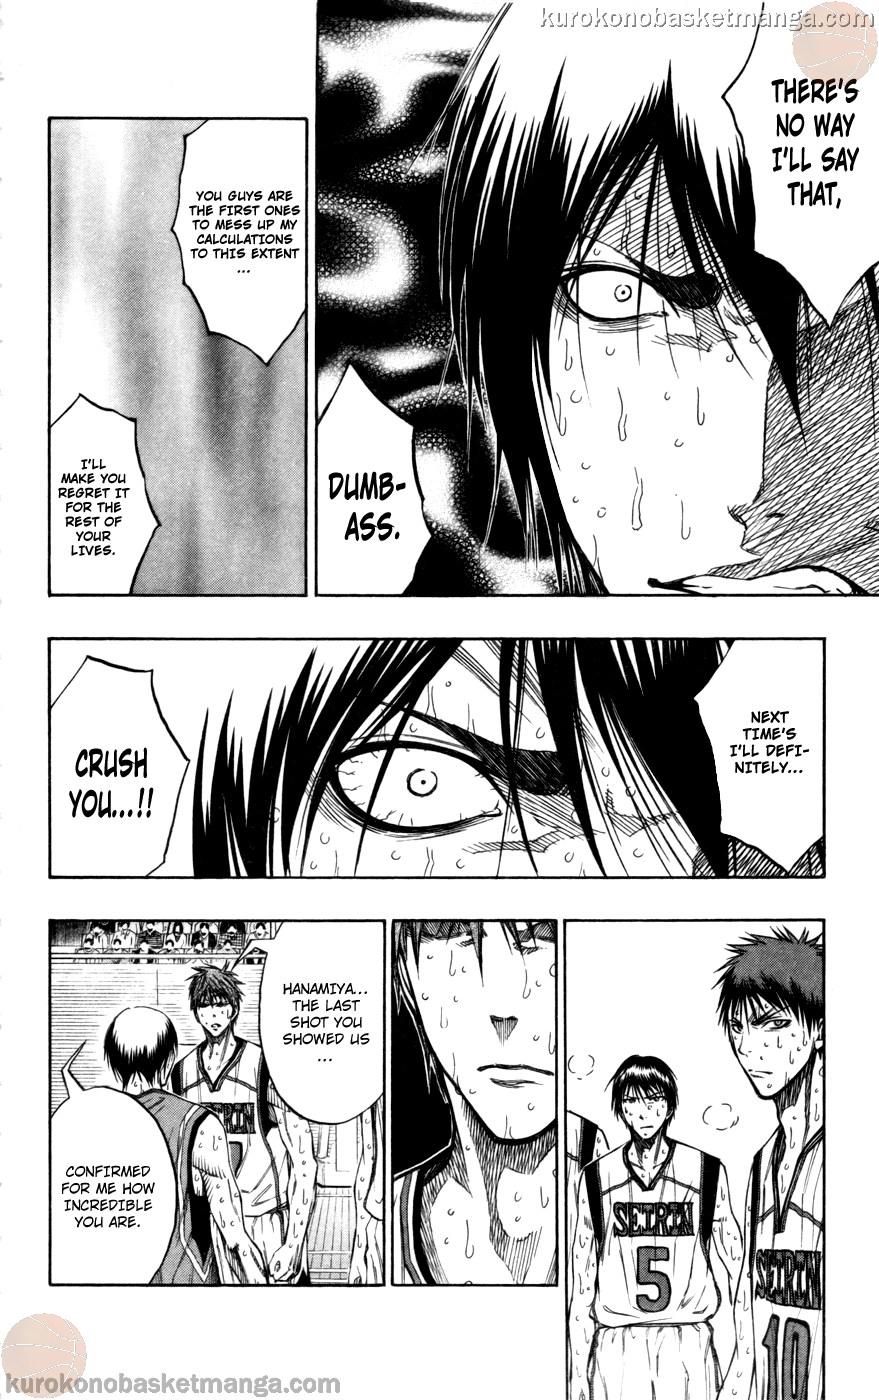 Kuroko no Basket Manga Chapter 108 - Image 06